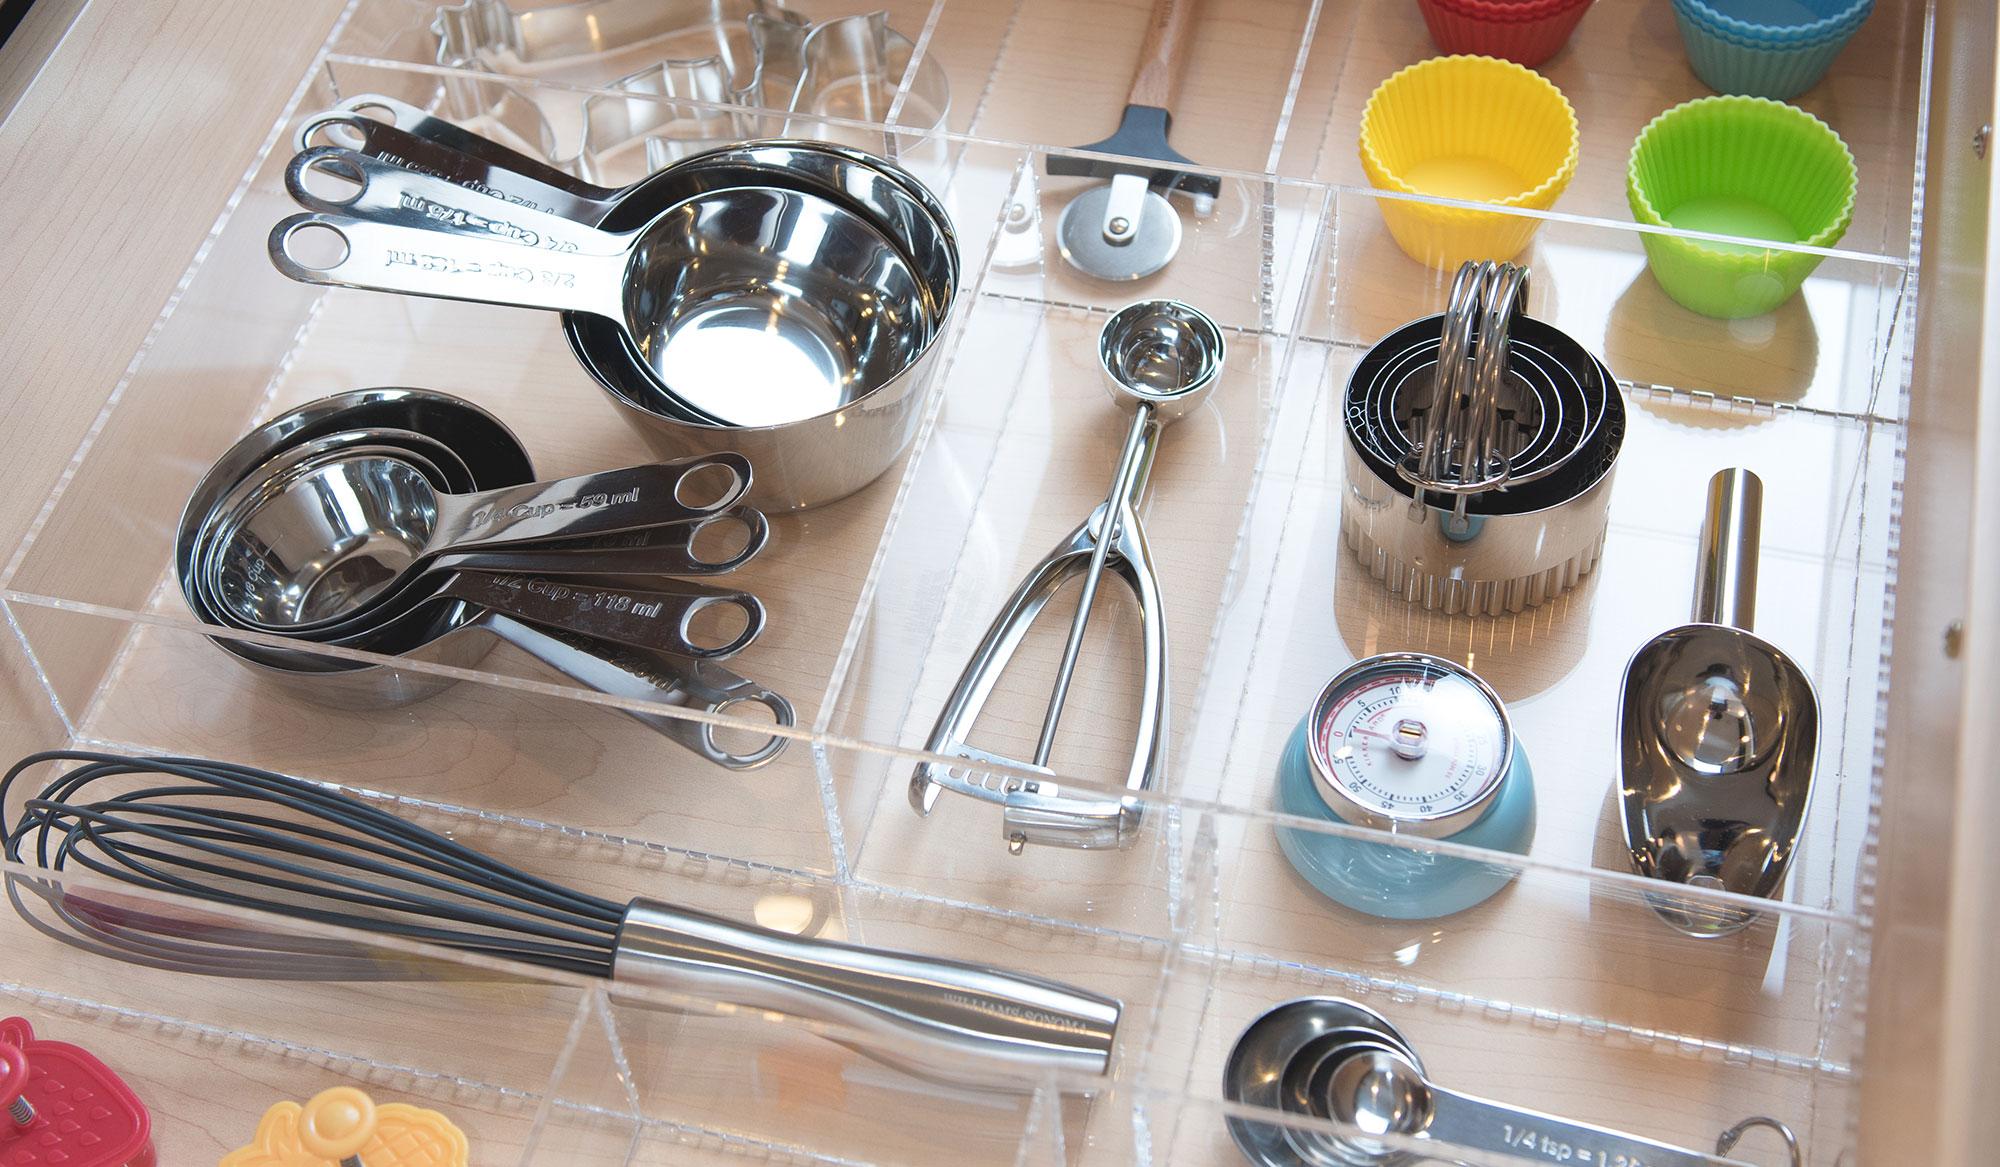 Custom Drawer Organizers - Organize My Drawer